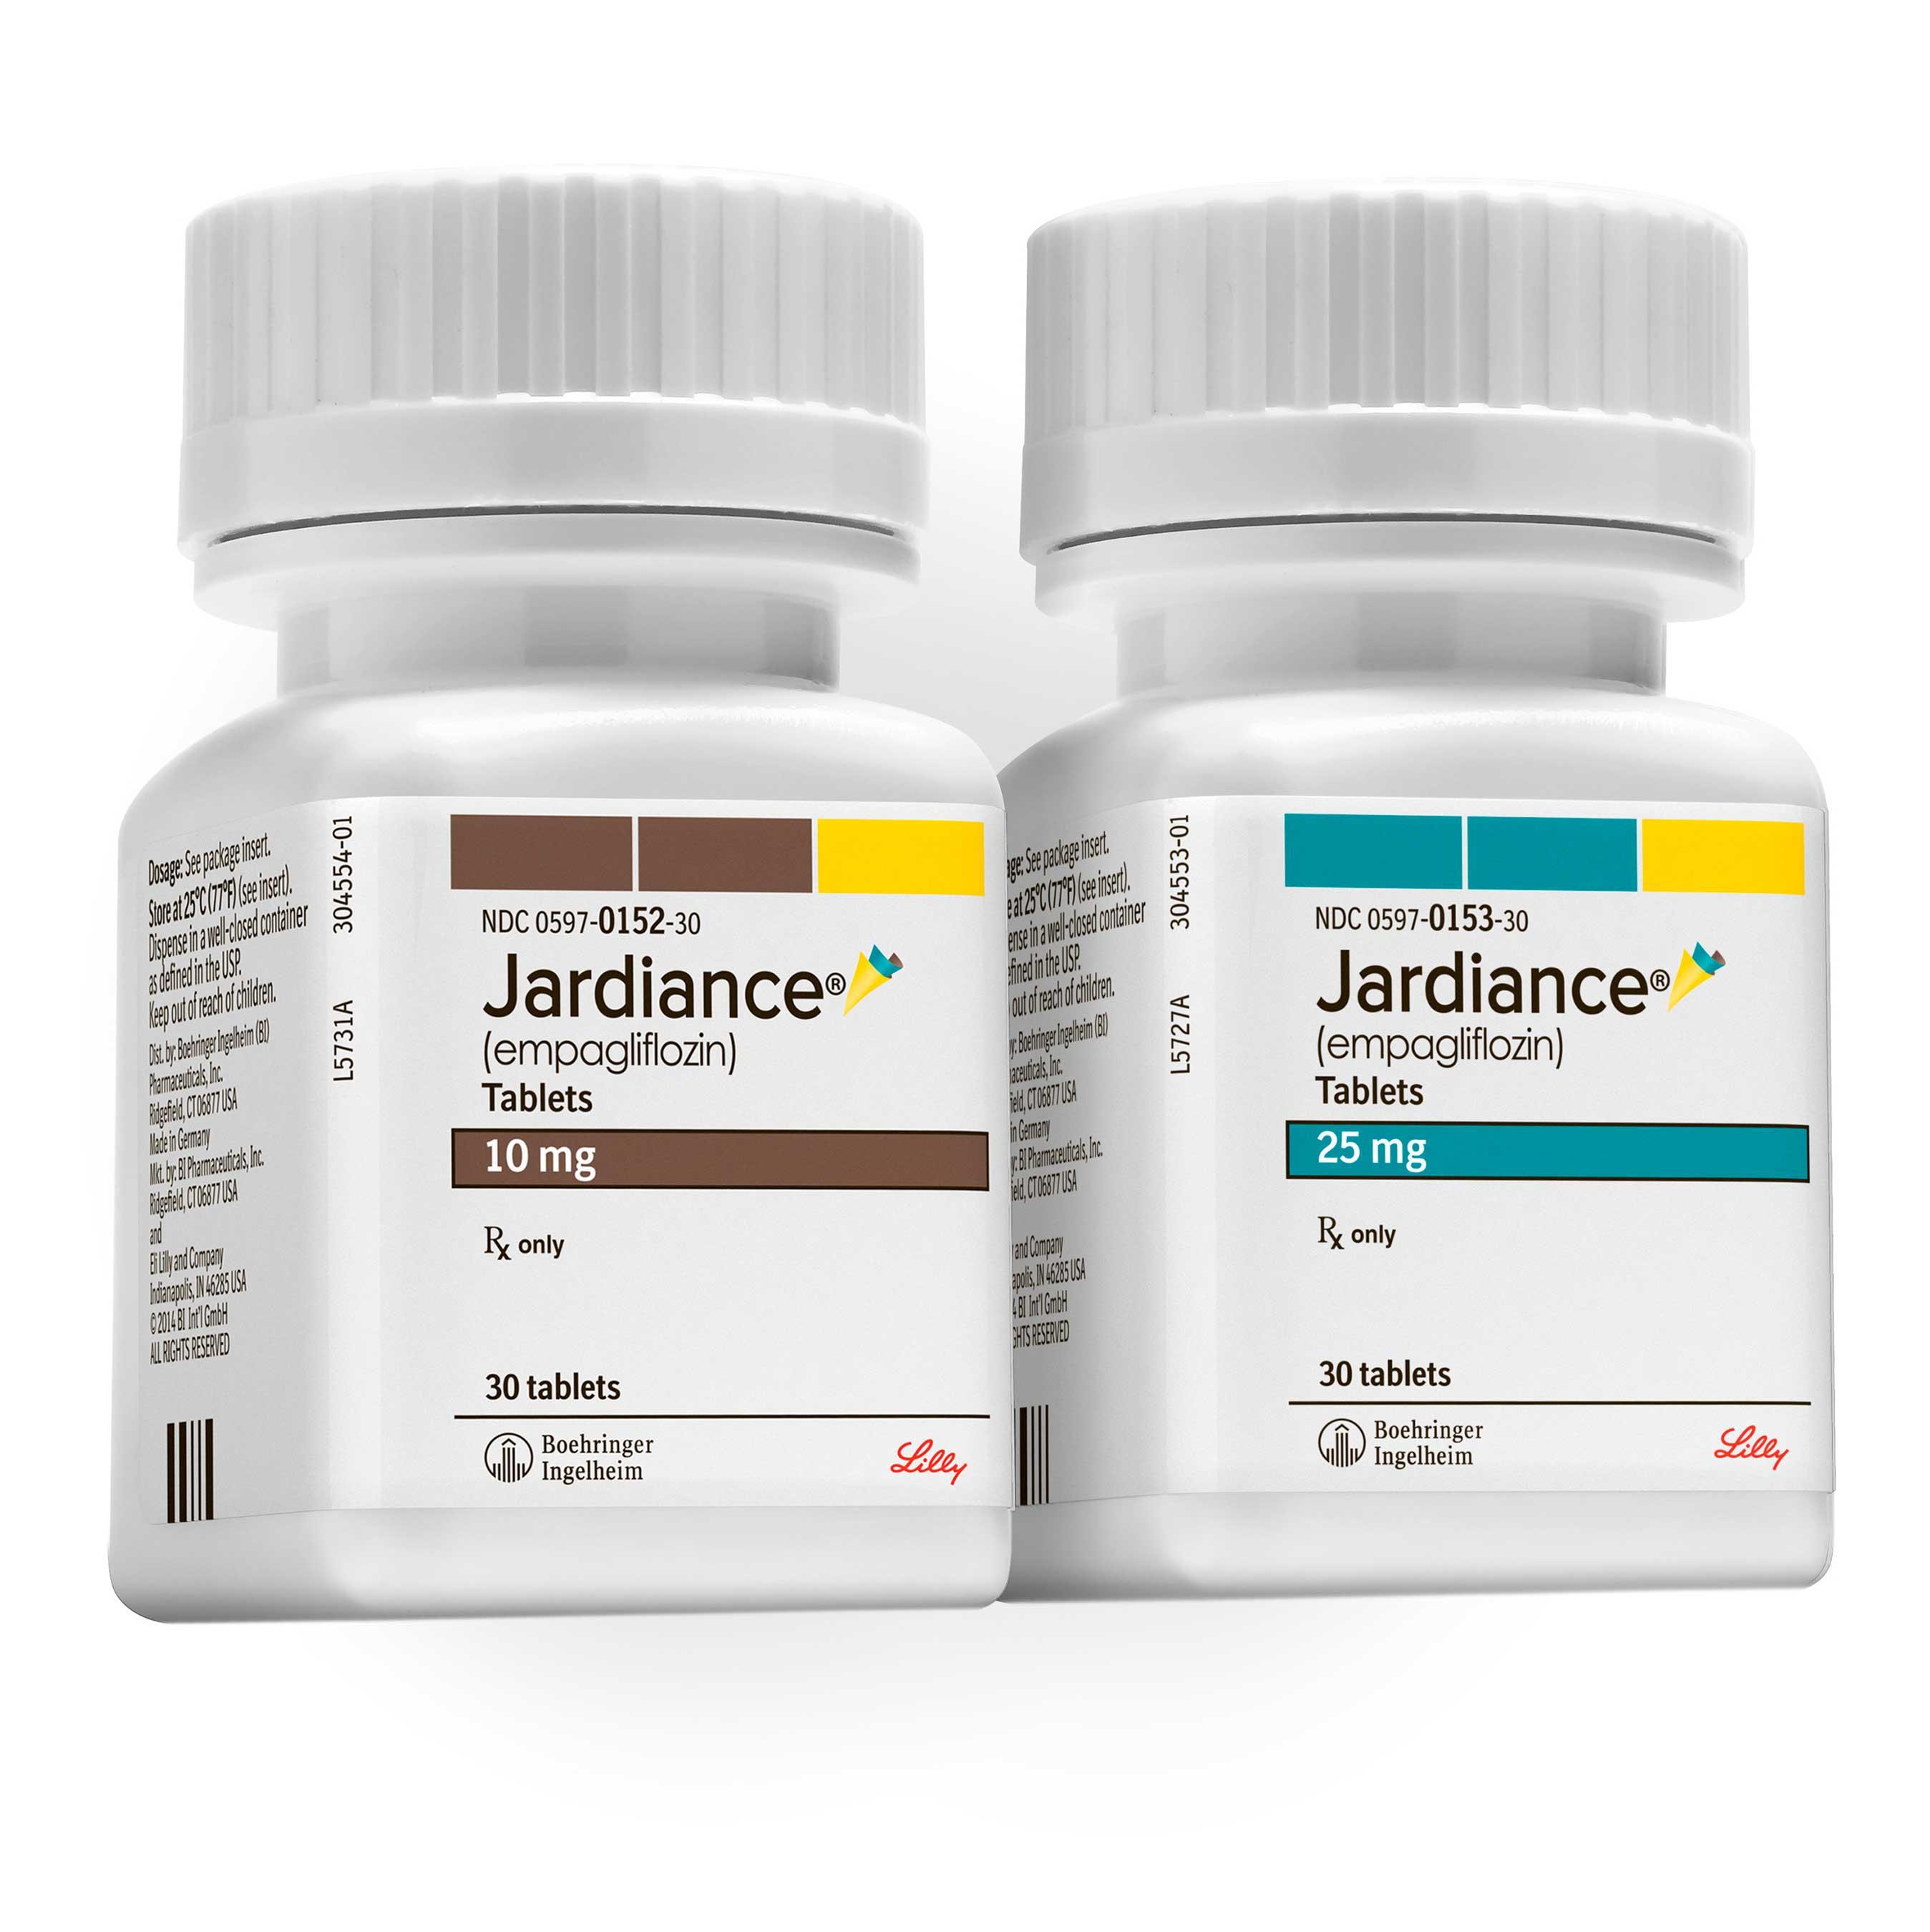 U S Fda Approves Jardiance 174 Empagliflozin Tablets To